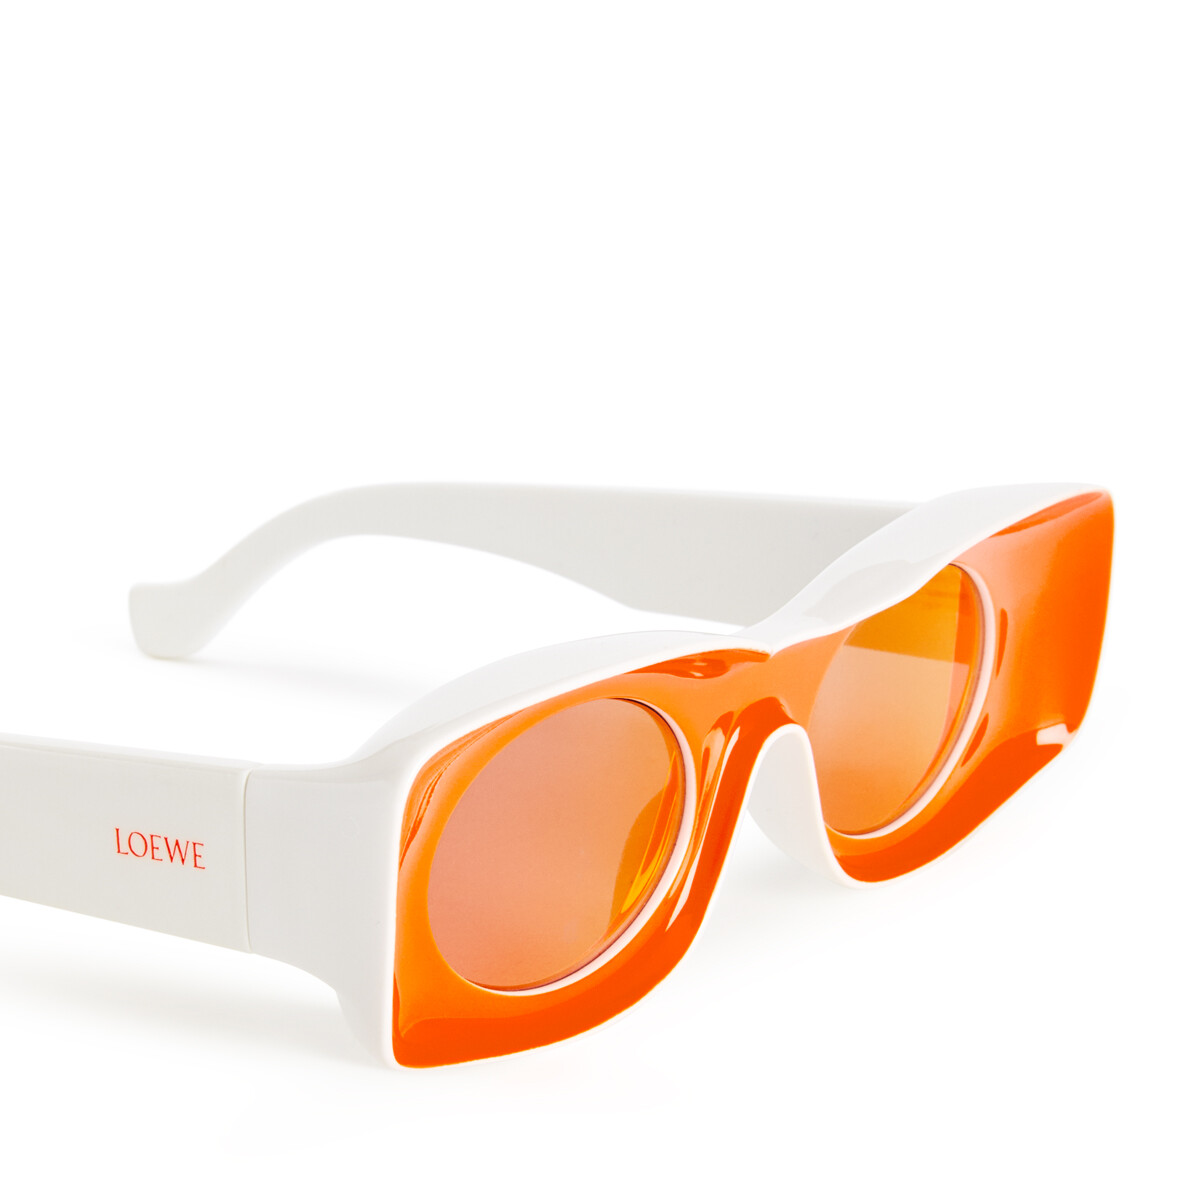 LOEWE Paula's Ibiza Original Sunglasses In Acetate Neon Orange front